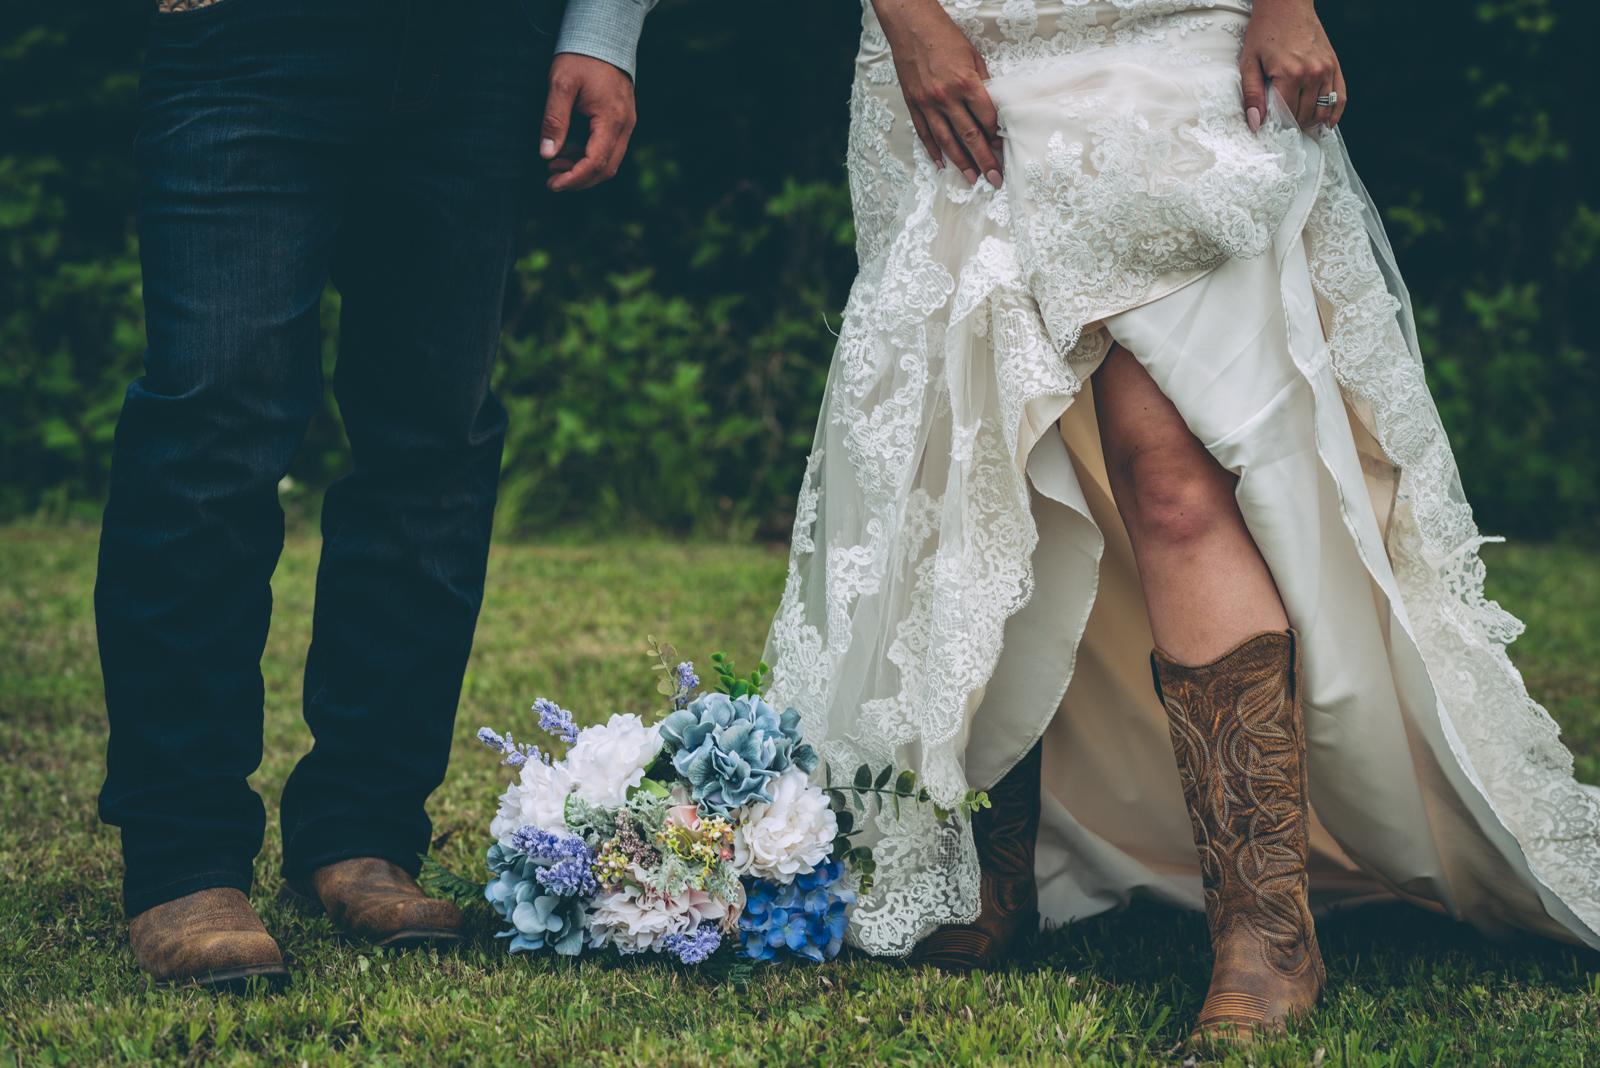 top-wedding-photos-2018-blog-35.jpg